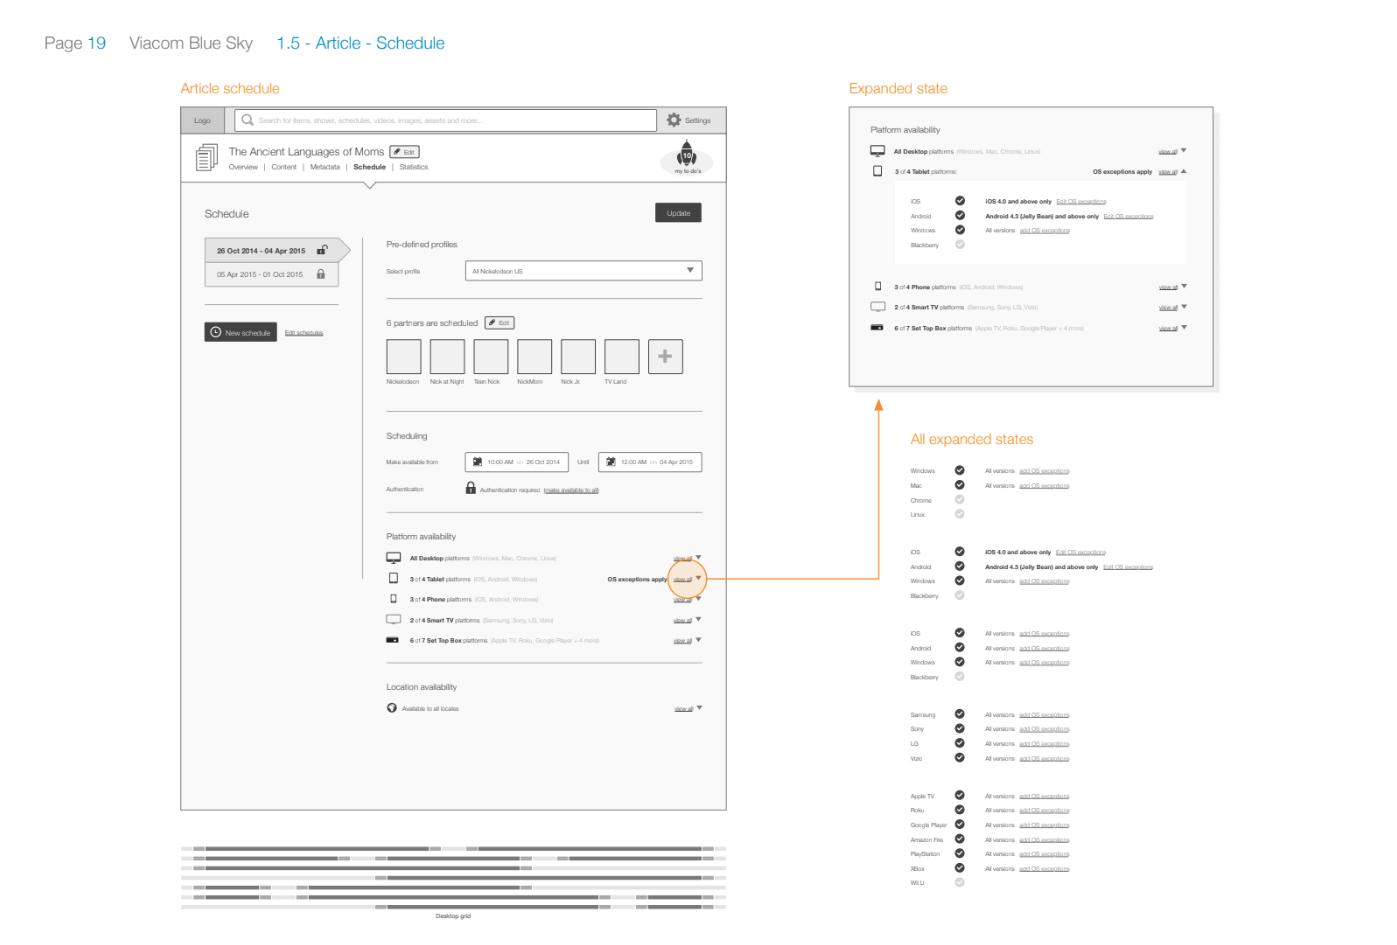 Article publishing - scheduler